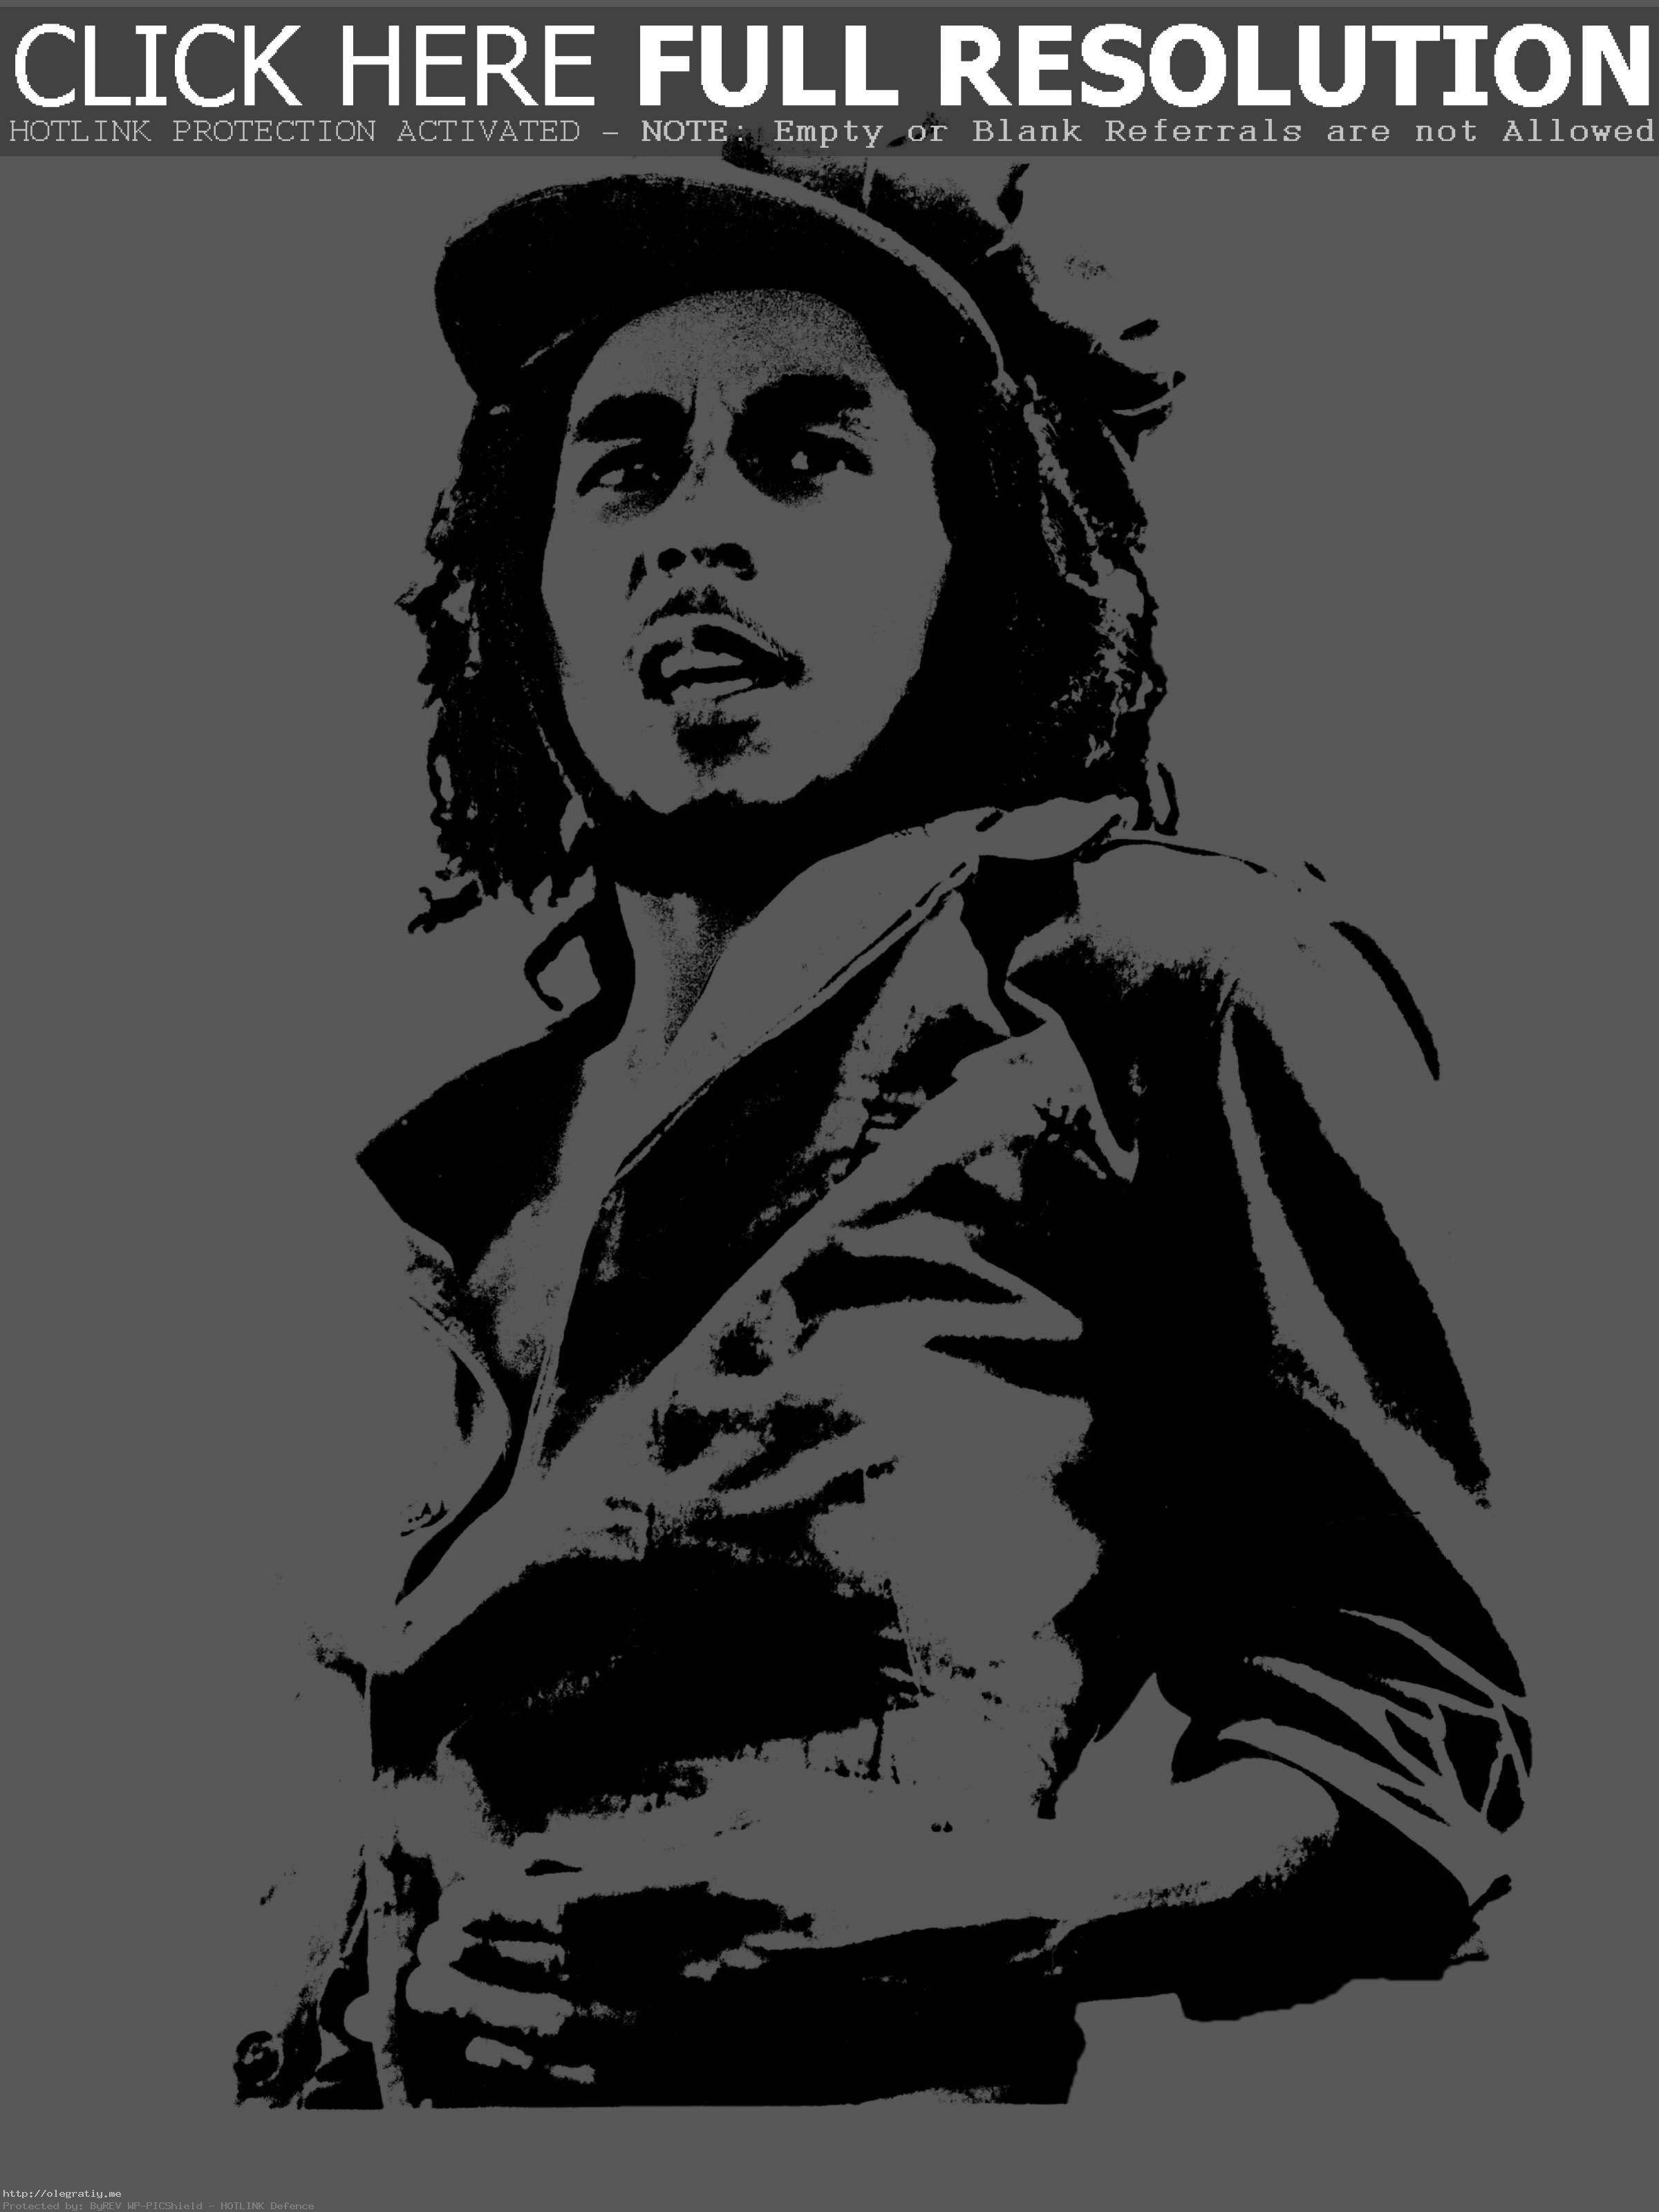 Bob Marley Cliparts Free Download Clip A-Bob Marley Cliparts Free Download Clip Art On Unbelievable Silhouettes-5